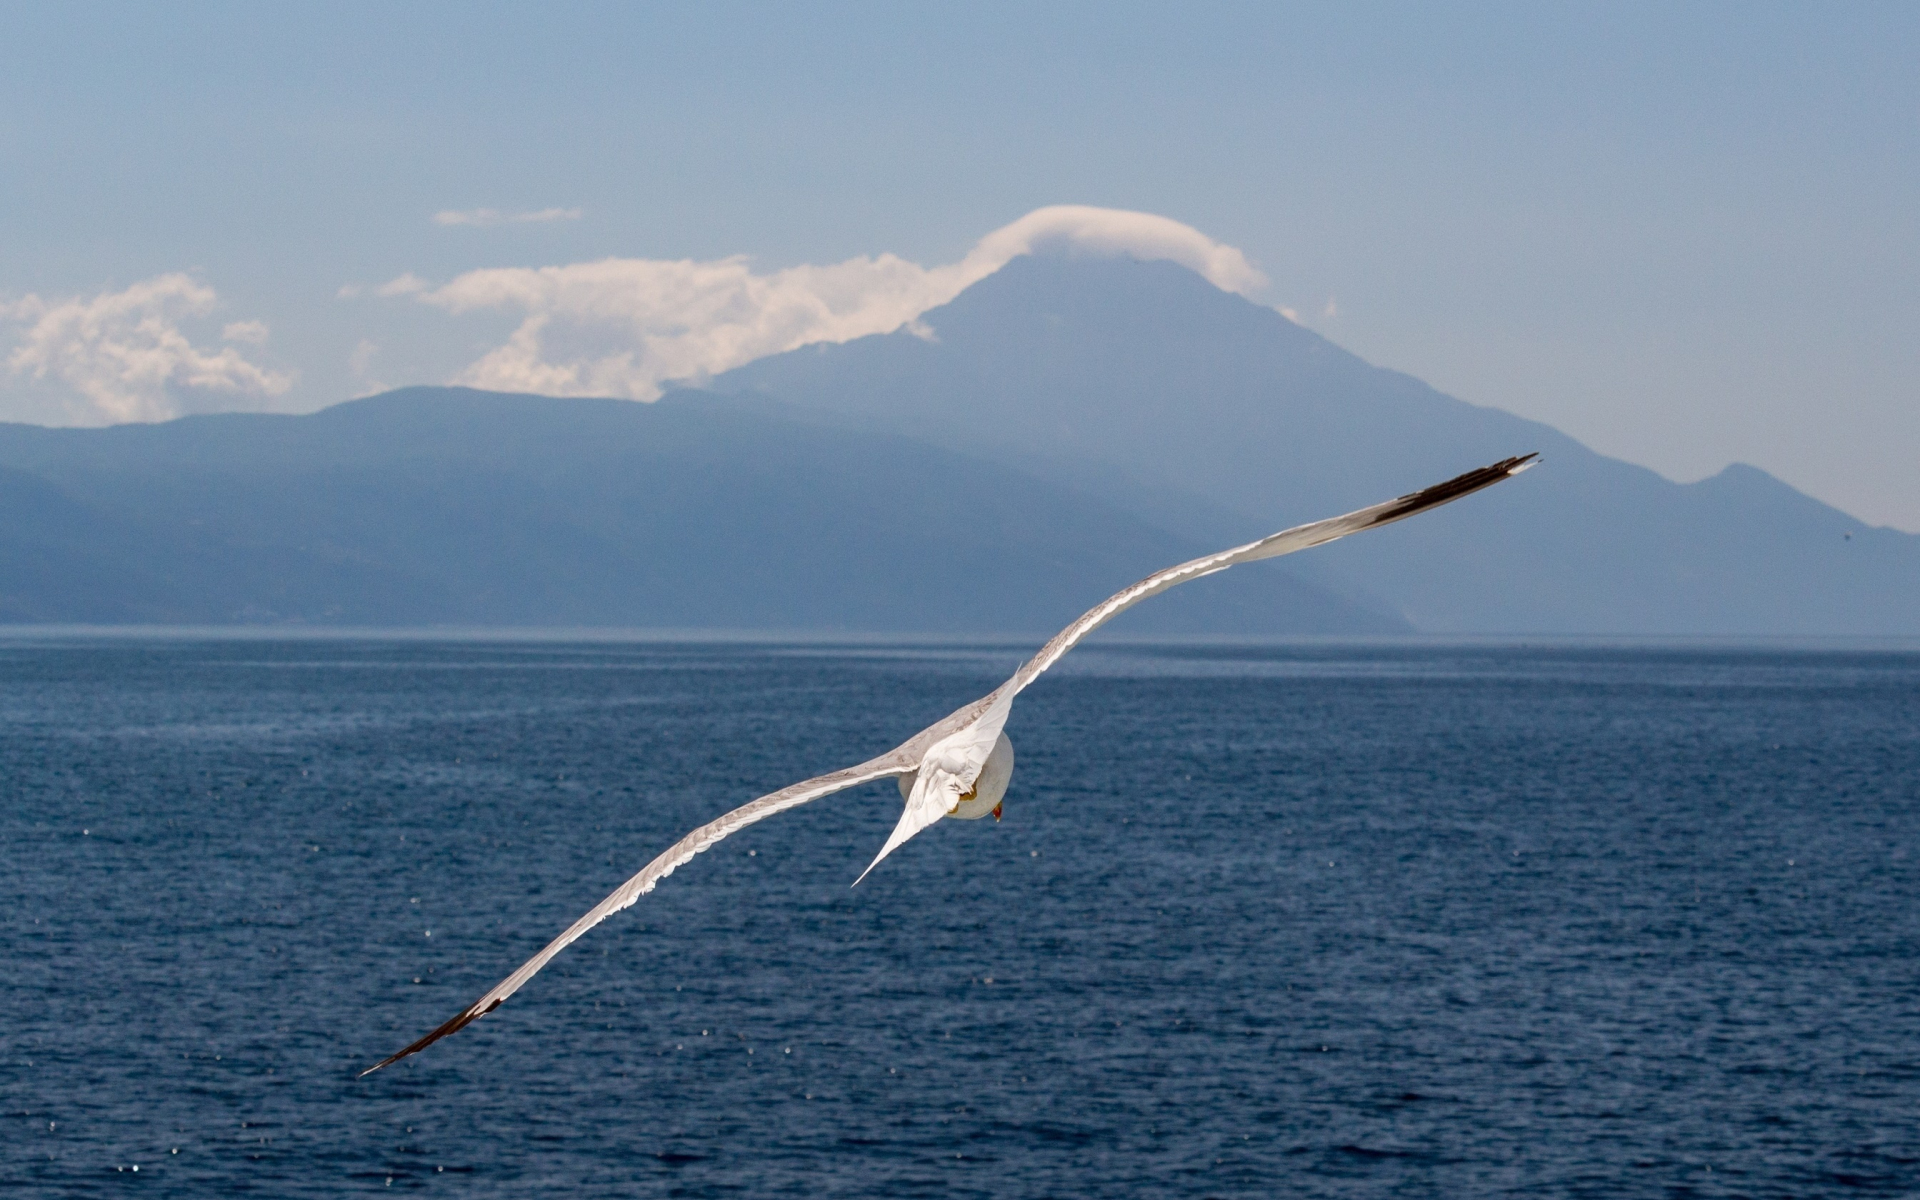 White bird, flight, sea, seagull, 1920x1200 wallpaper